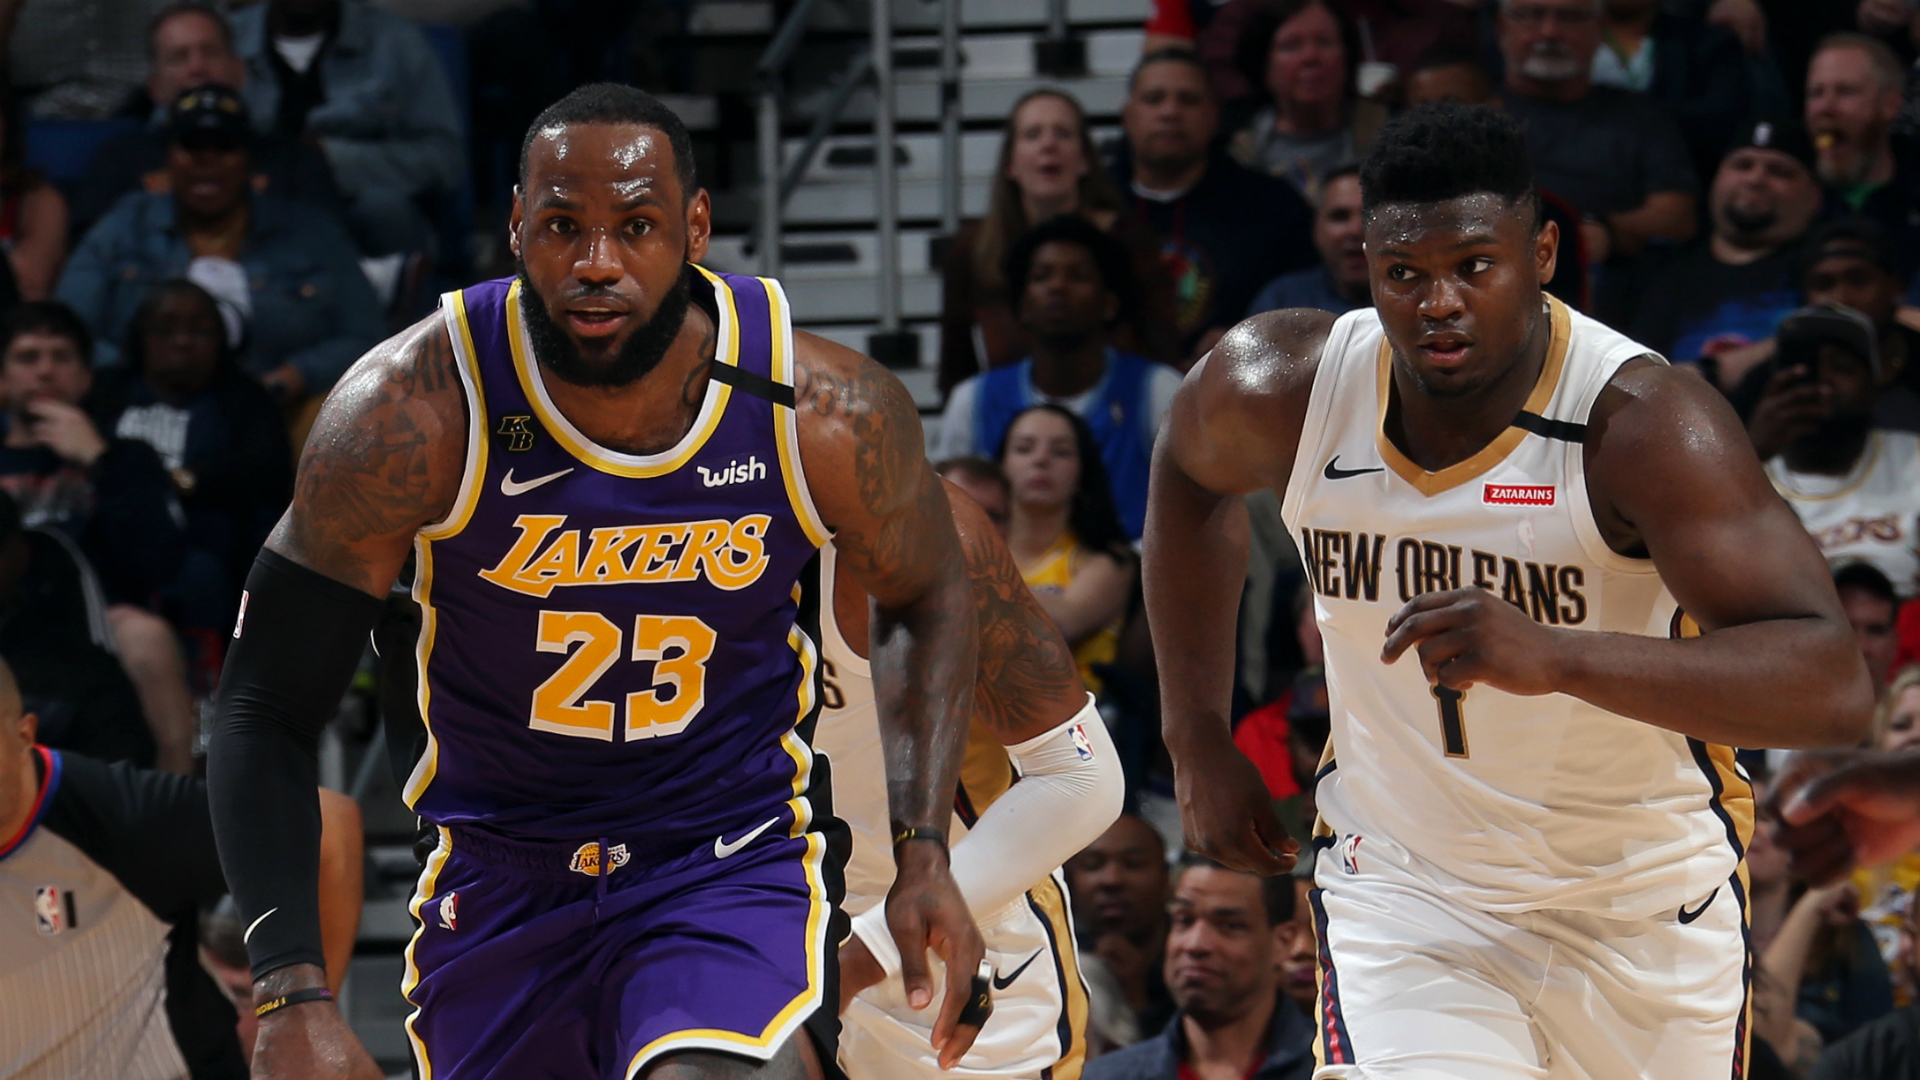 Lakers @ Pelicans